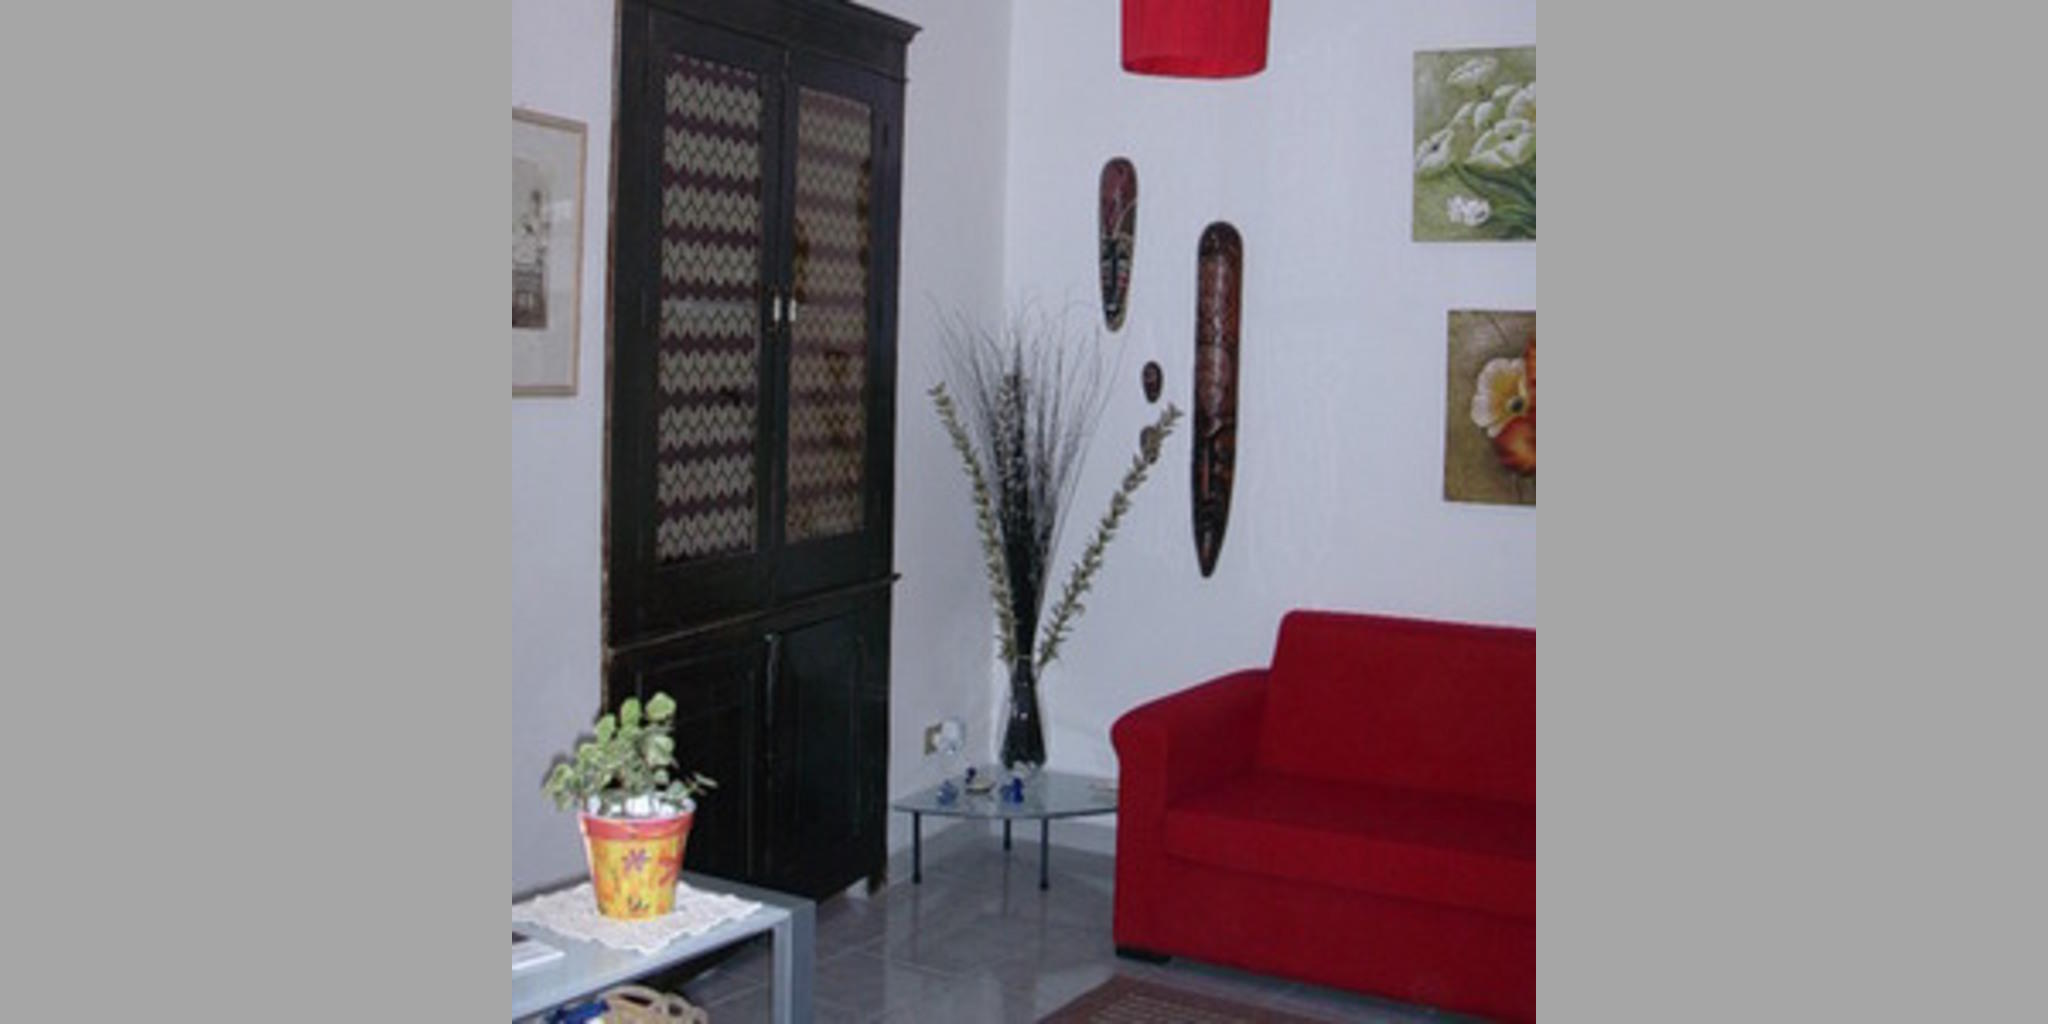 Bed & Breakfast Palazzolo Acreide - Zocco